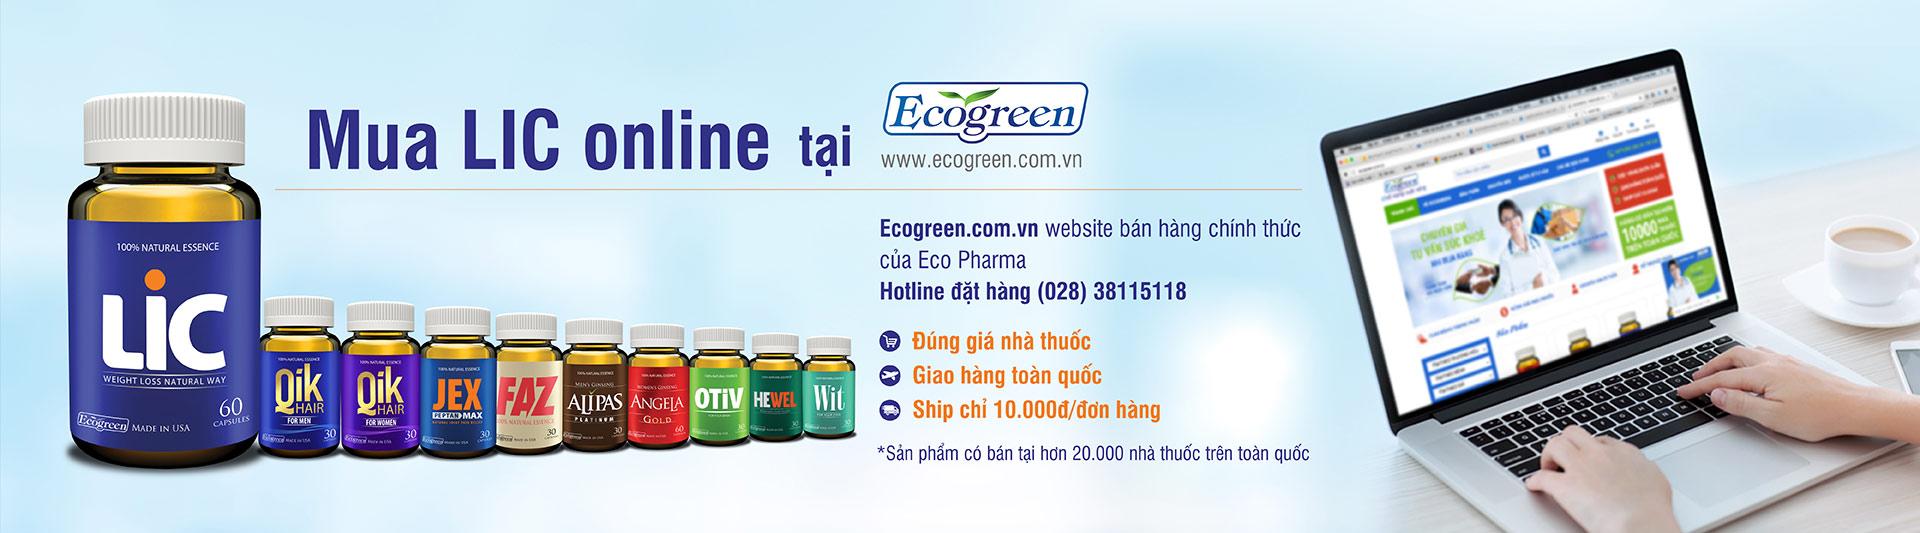 banner car ecogreen 123